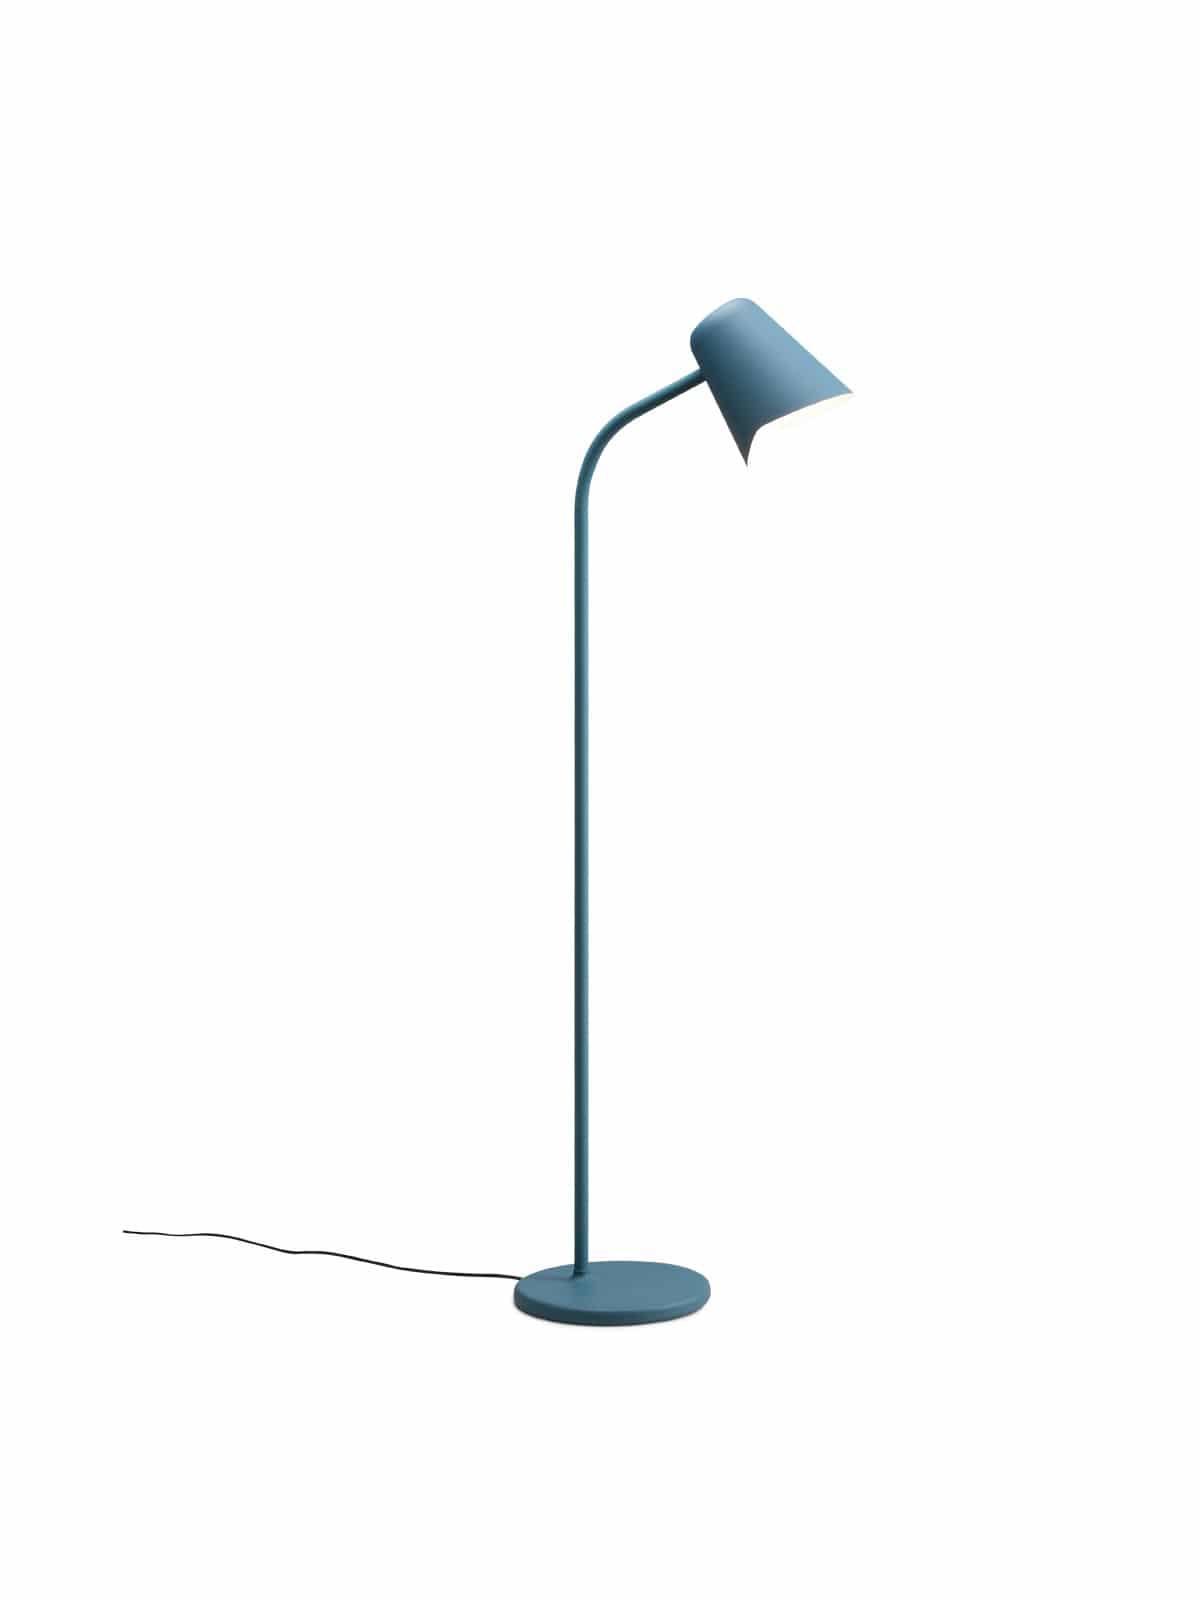 Me - Lampen Leuchten Designerleuchten Online Berlin Design